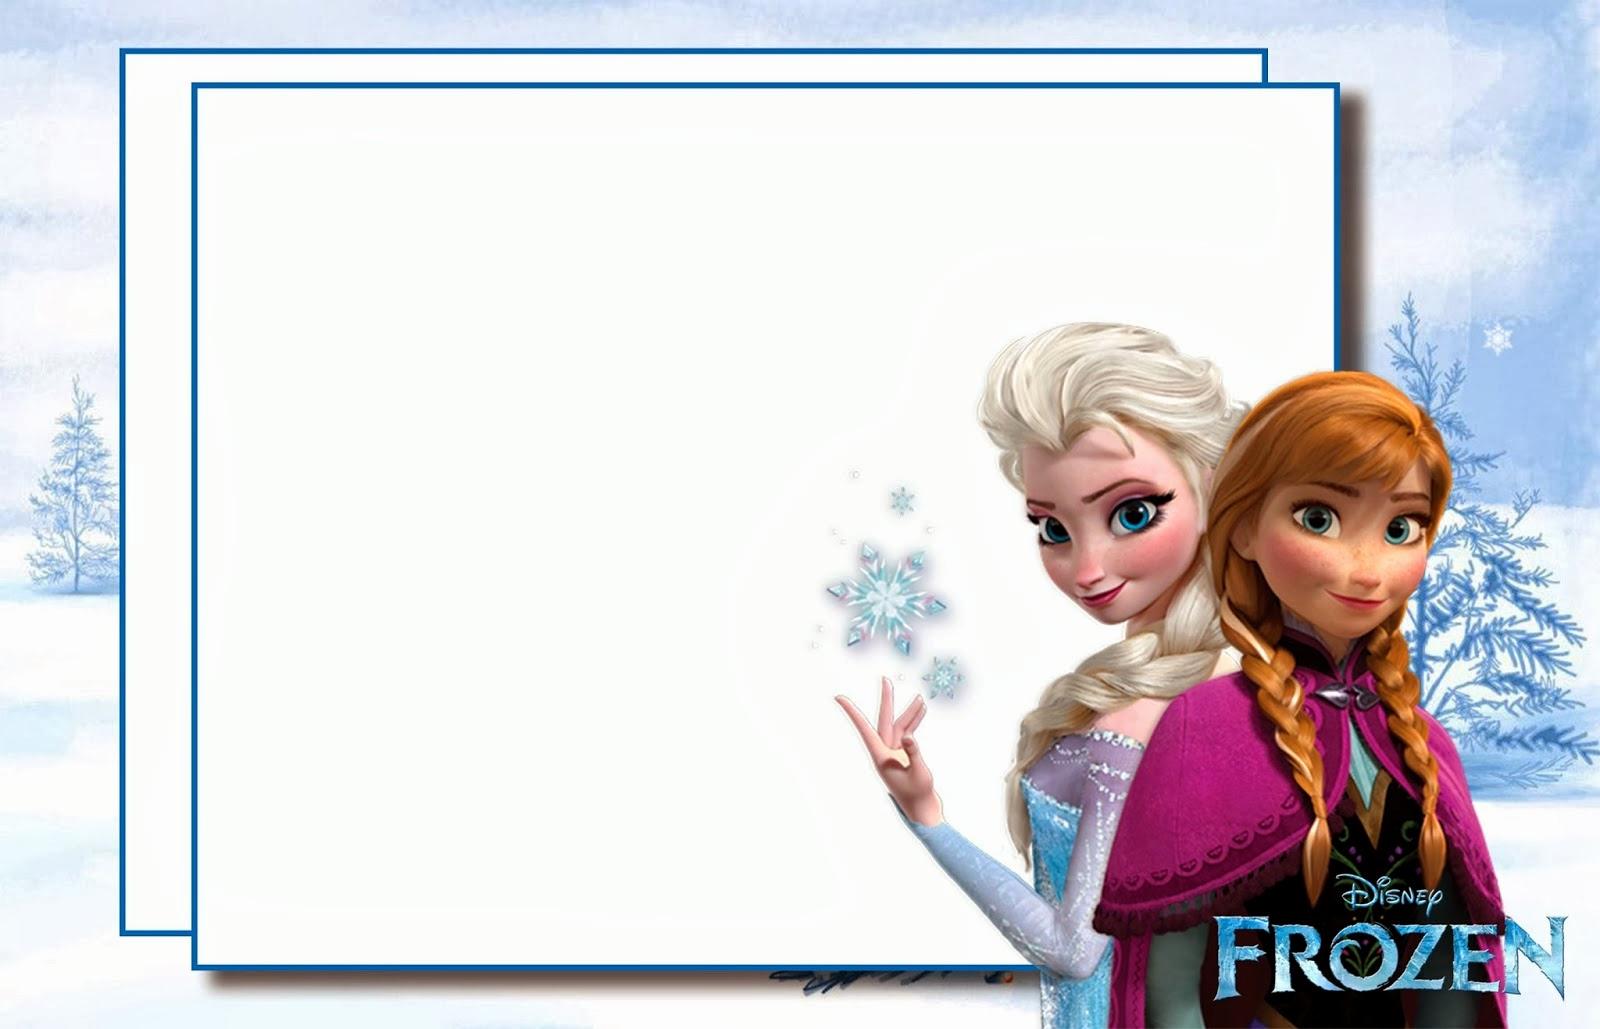 Frozen Invitation Printable Free Unique Frozen Party Free Printable Invitations